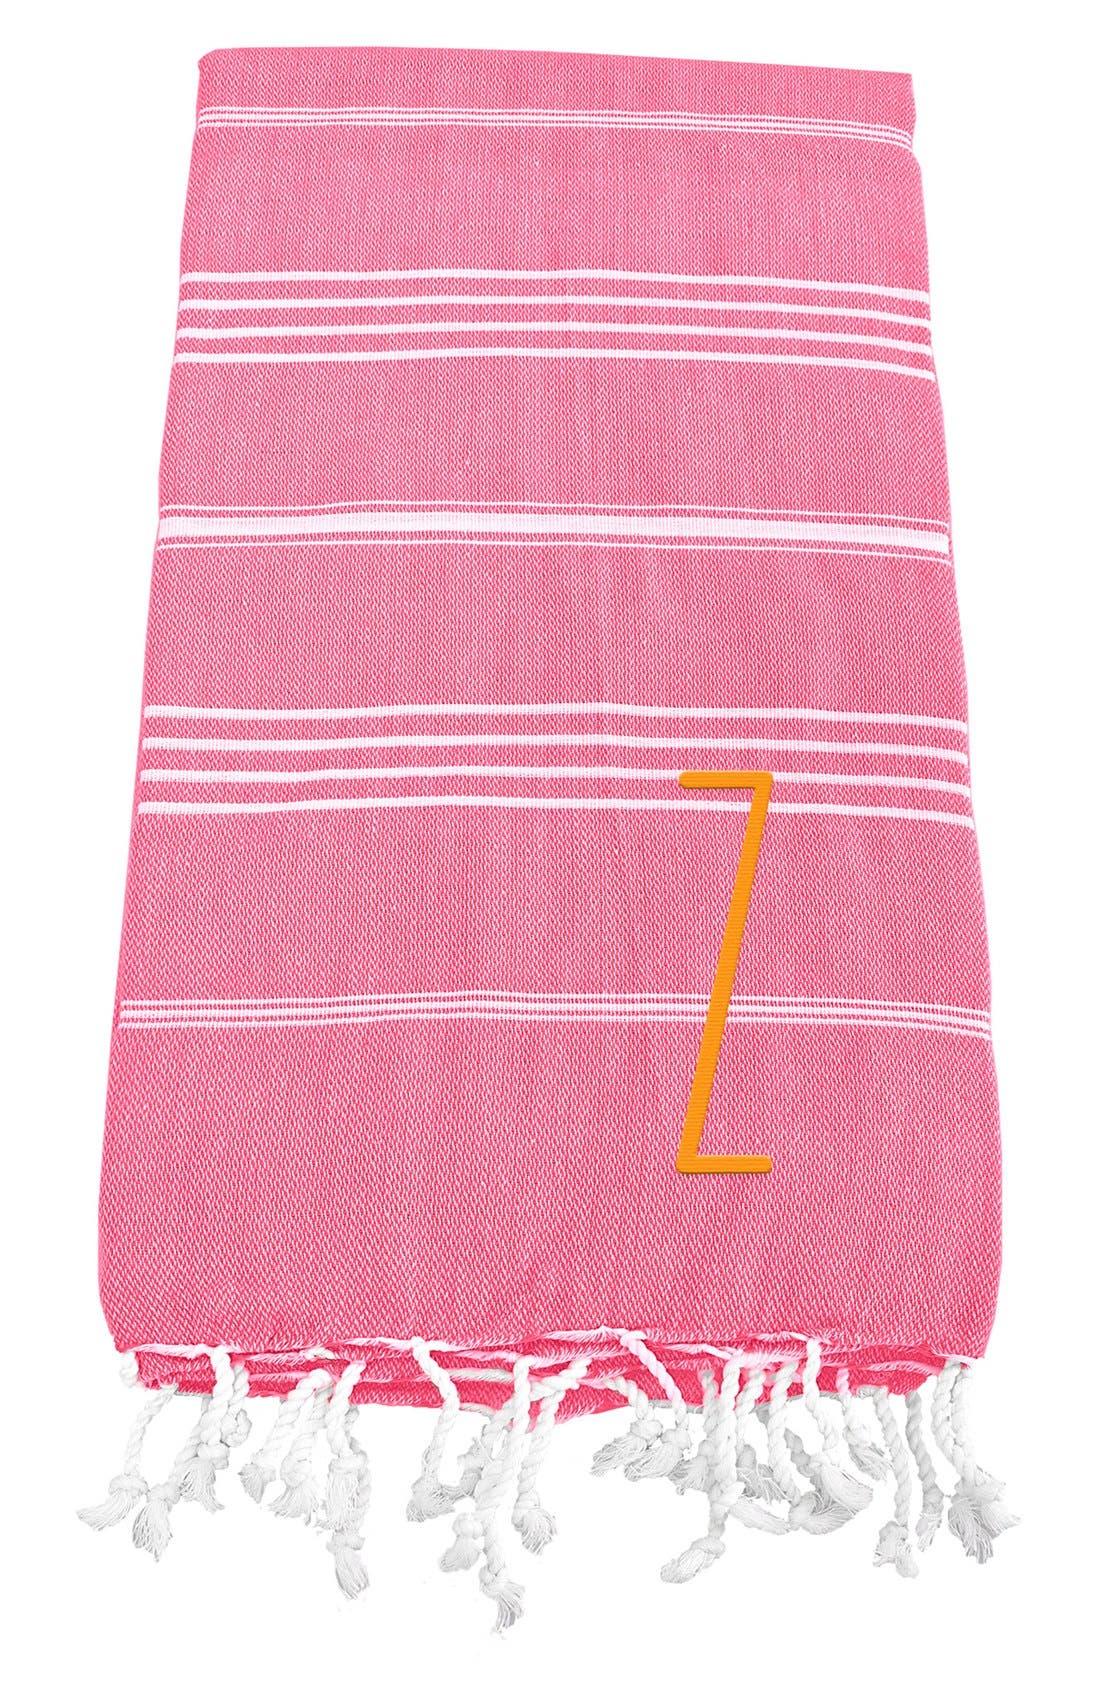 Monogram Turkish Cotton Towel,                             Main thumbnail 162, color,